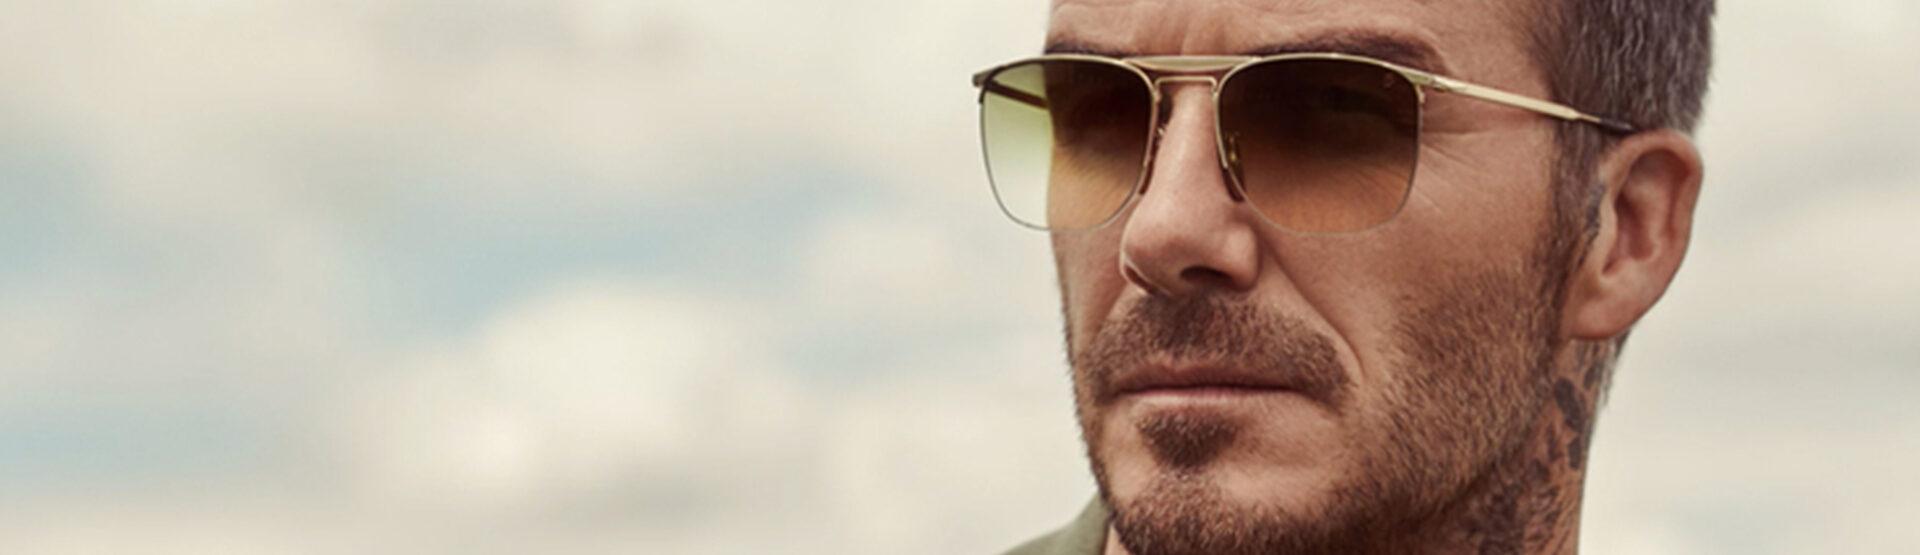 occhiali david beckham